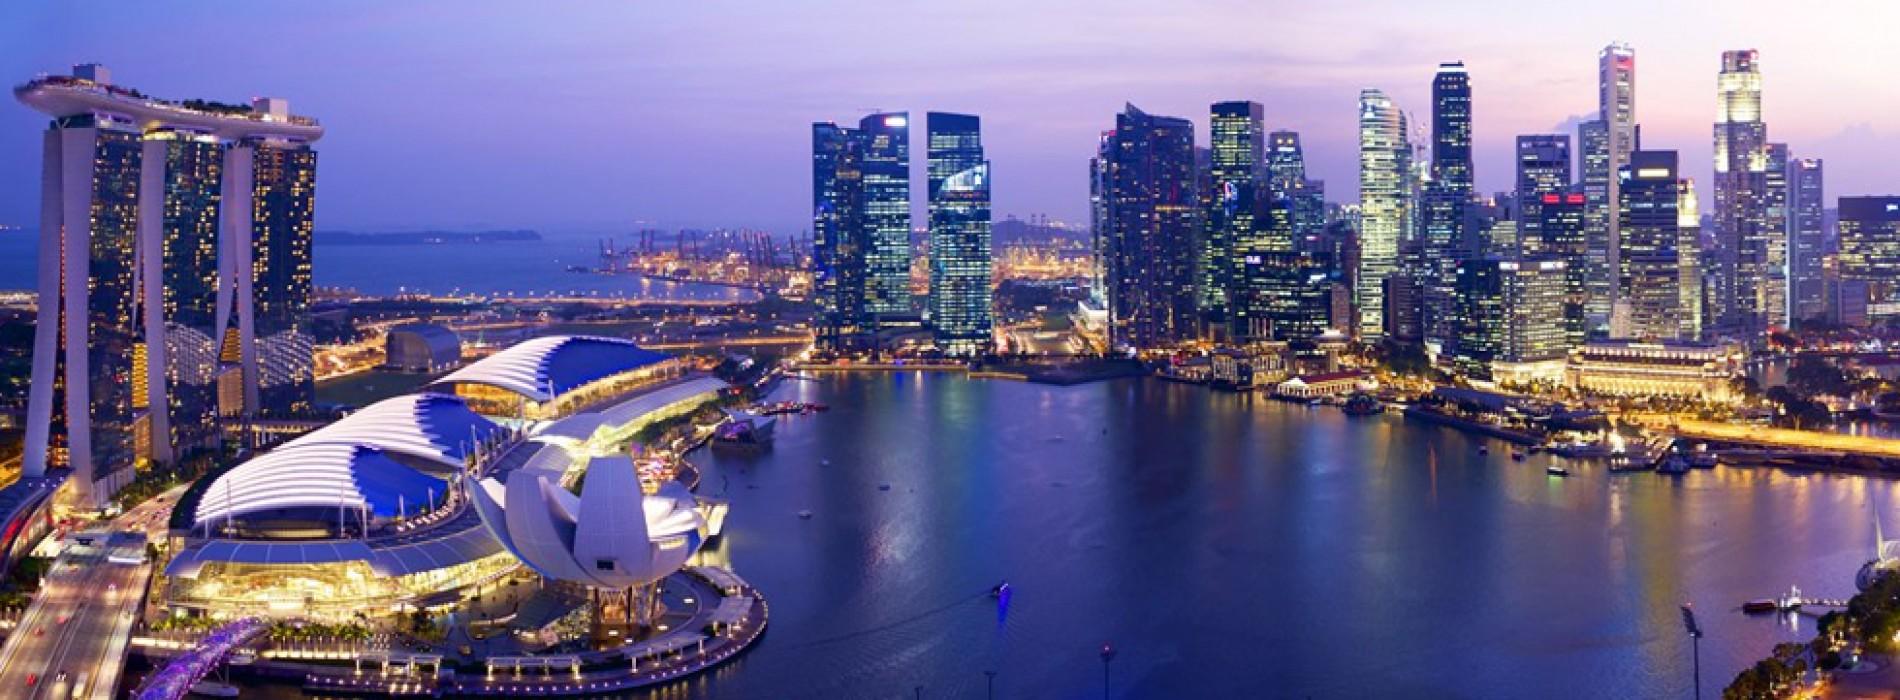 JW Marriott brand debuts in Singapore